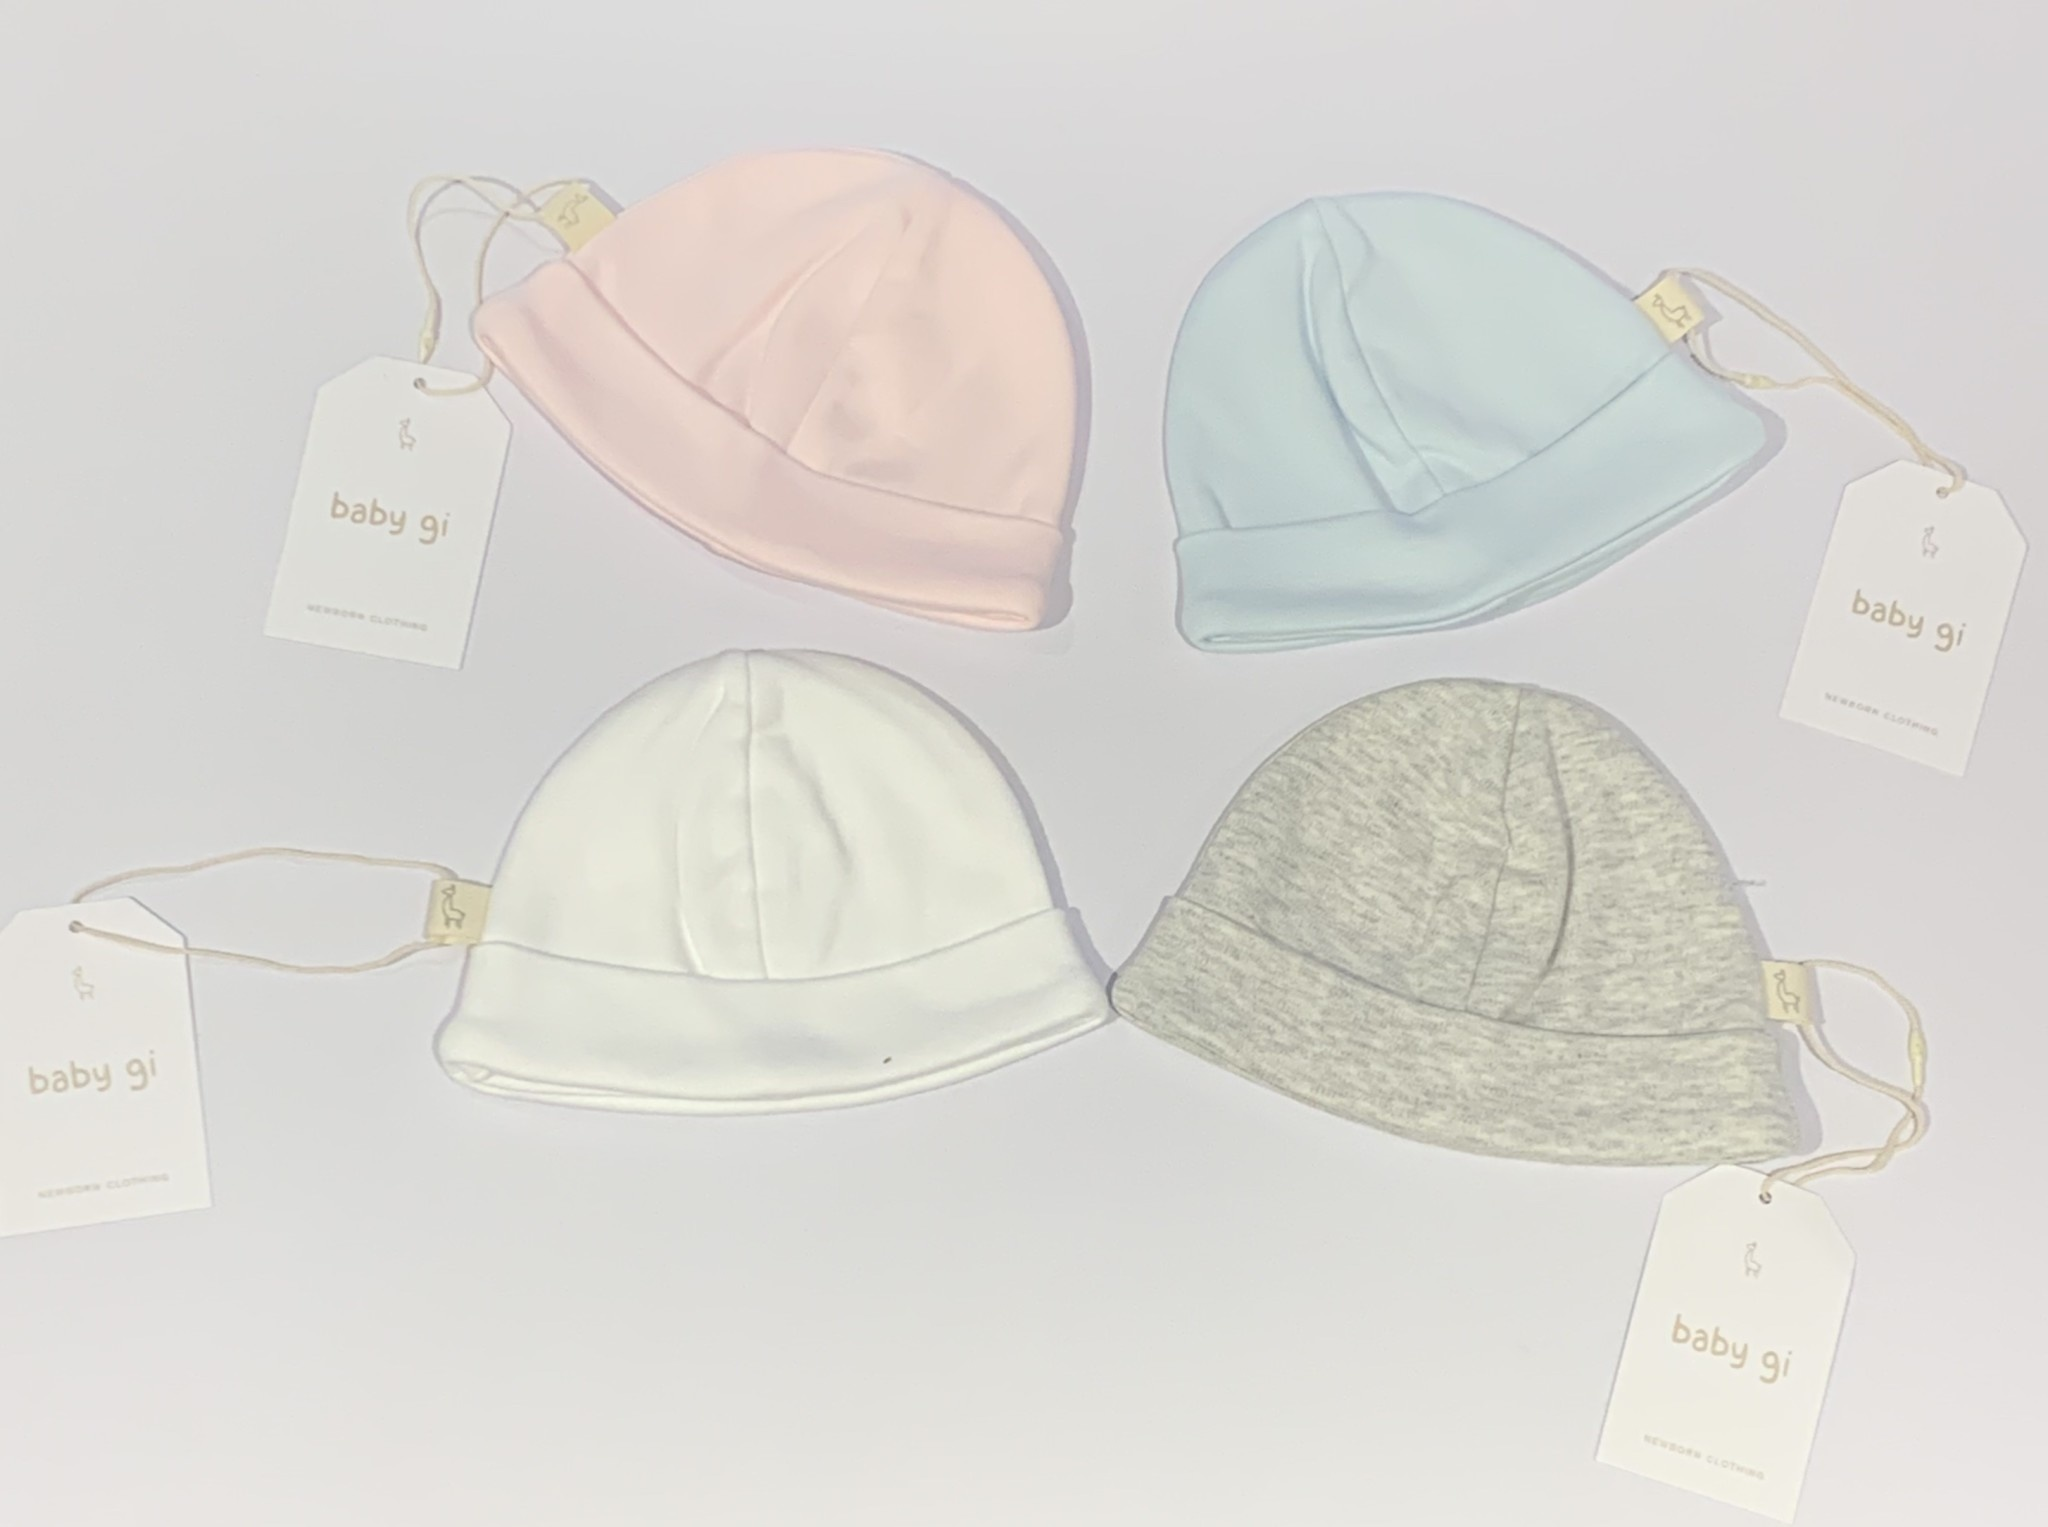 Baby Gi Baby gi cotton hat 0-1 month LAST ONE GREY